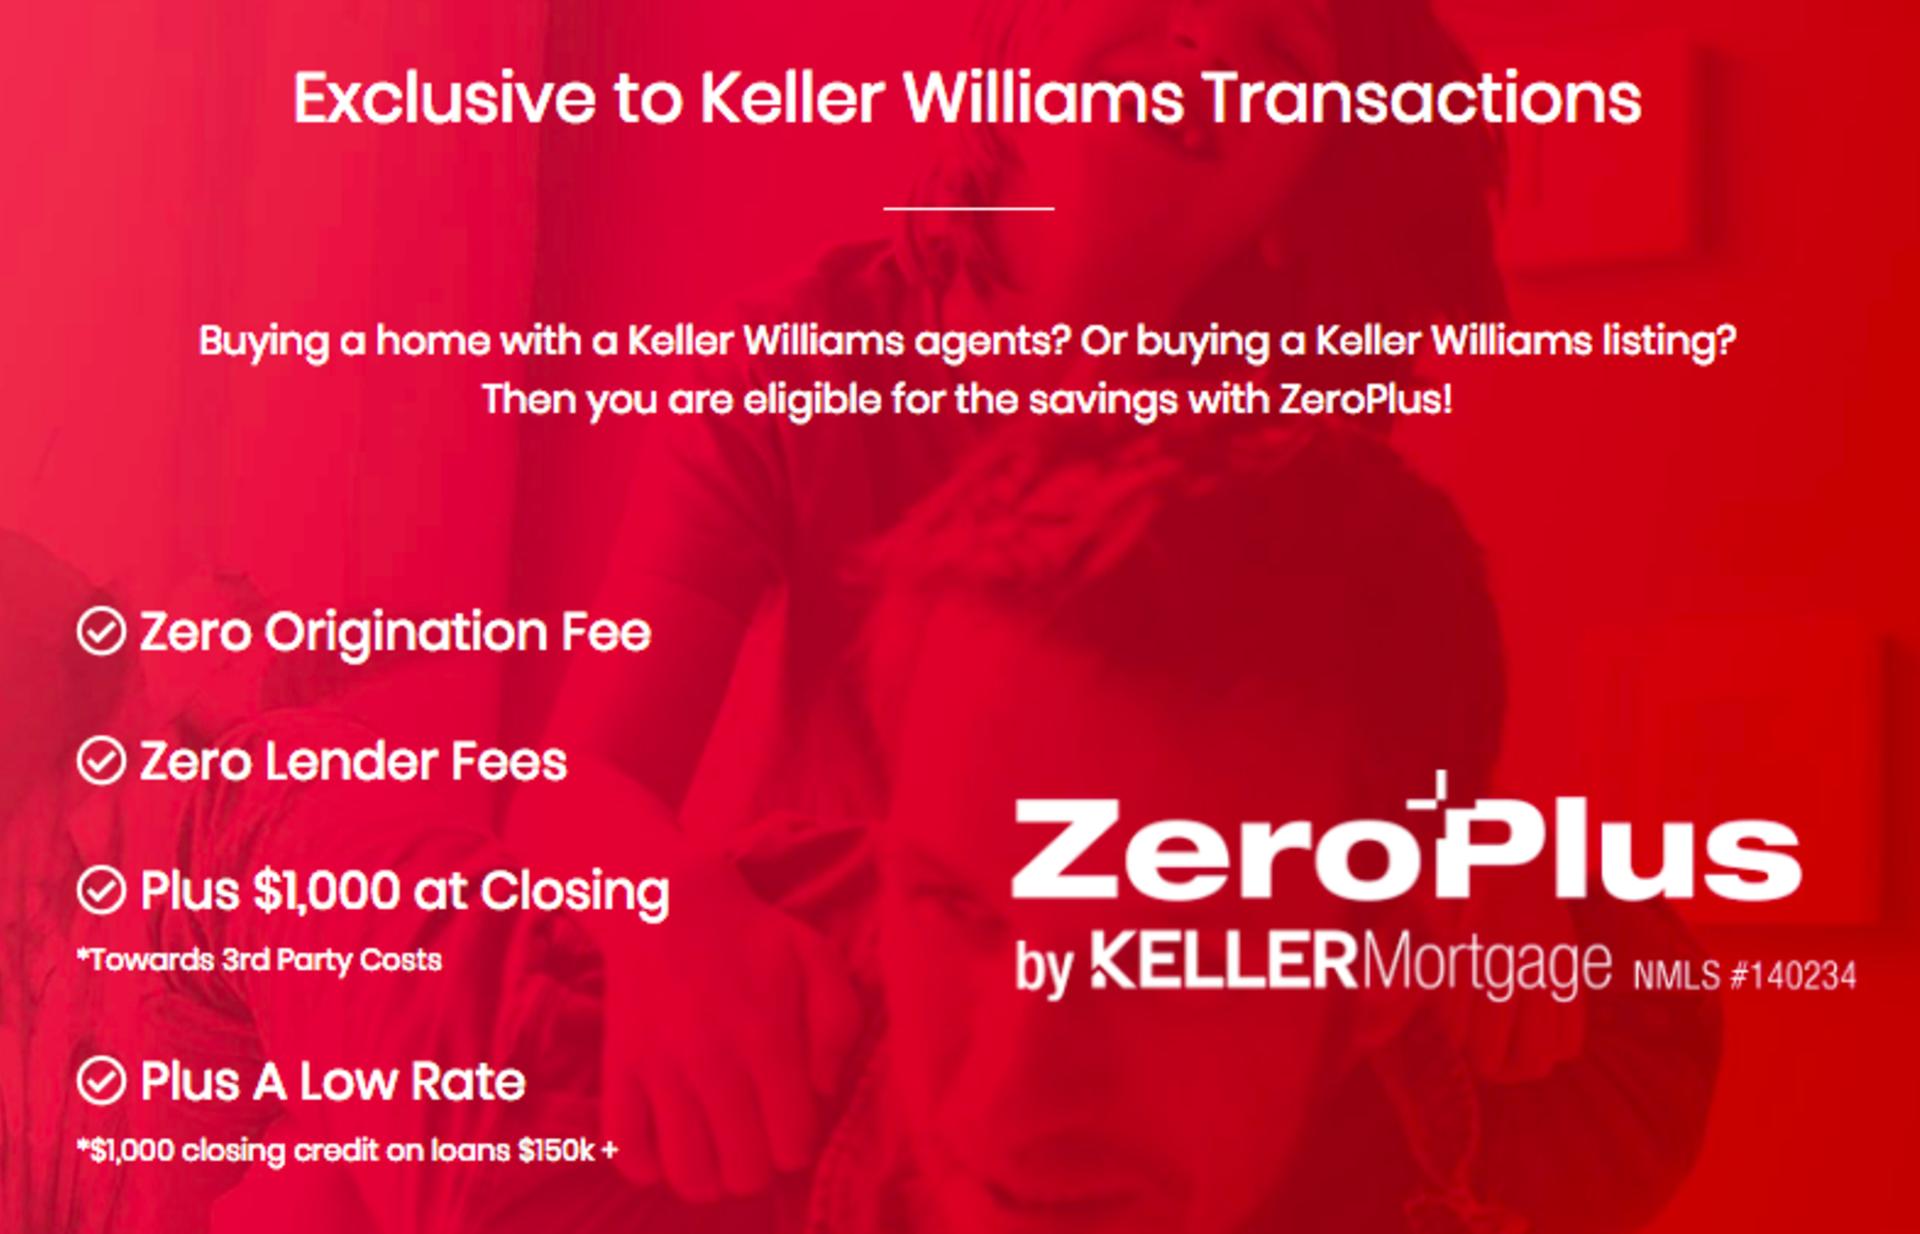 Keller Mortgage – Major Savings Exclusive to Keller Williams Transactions